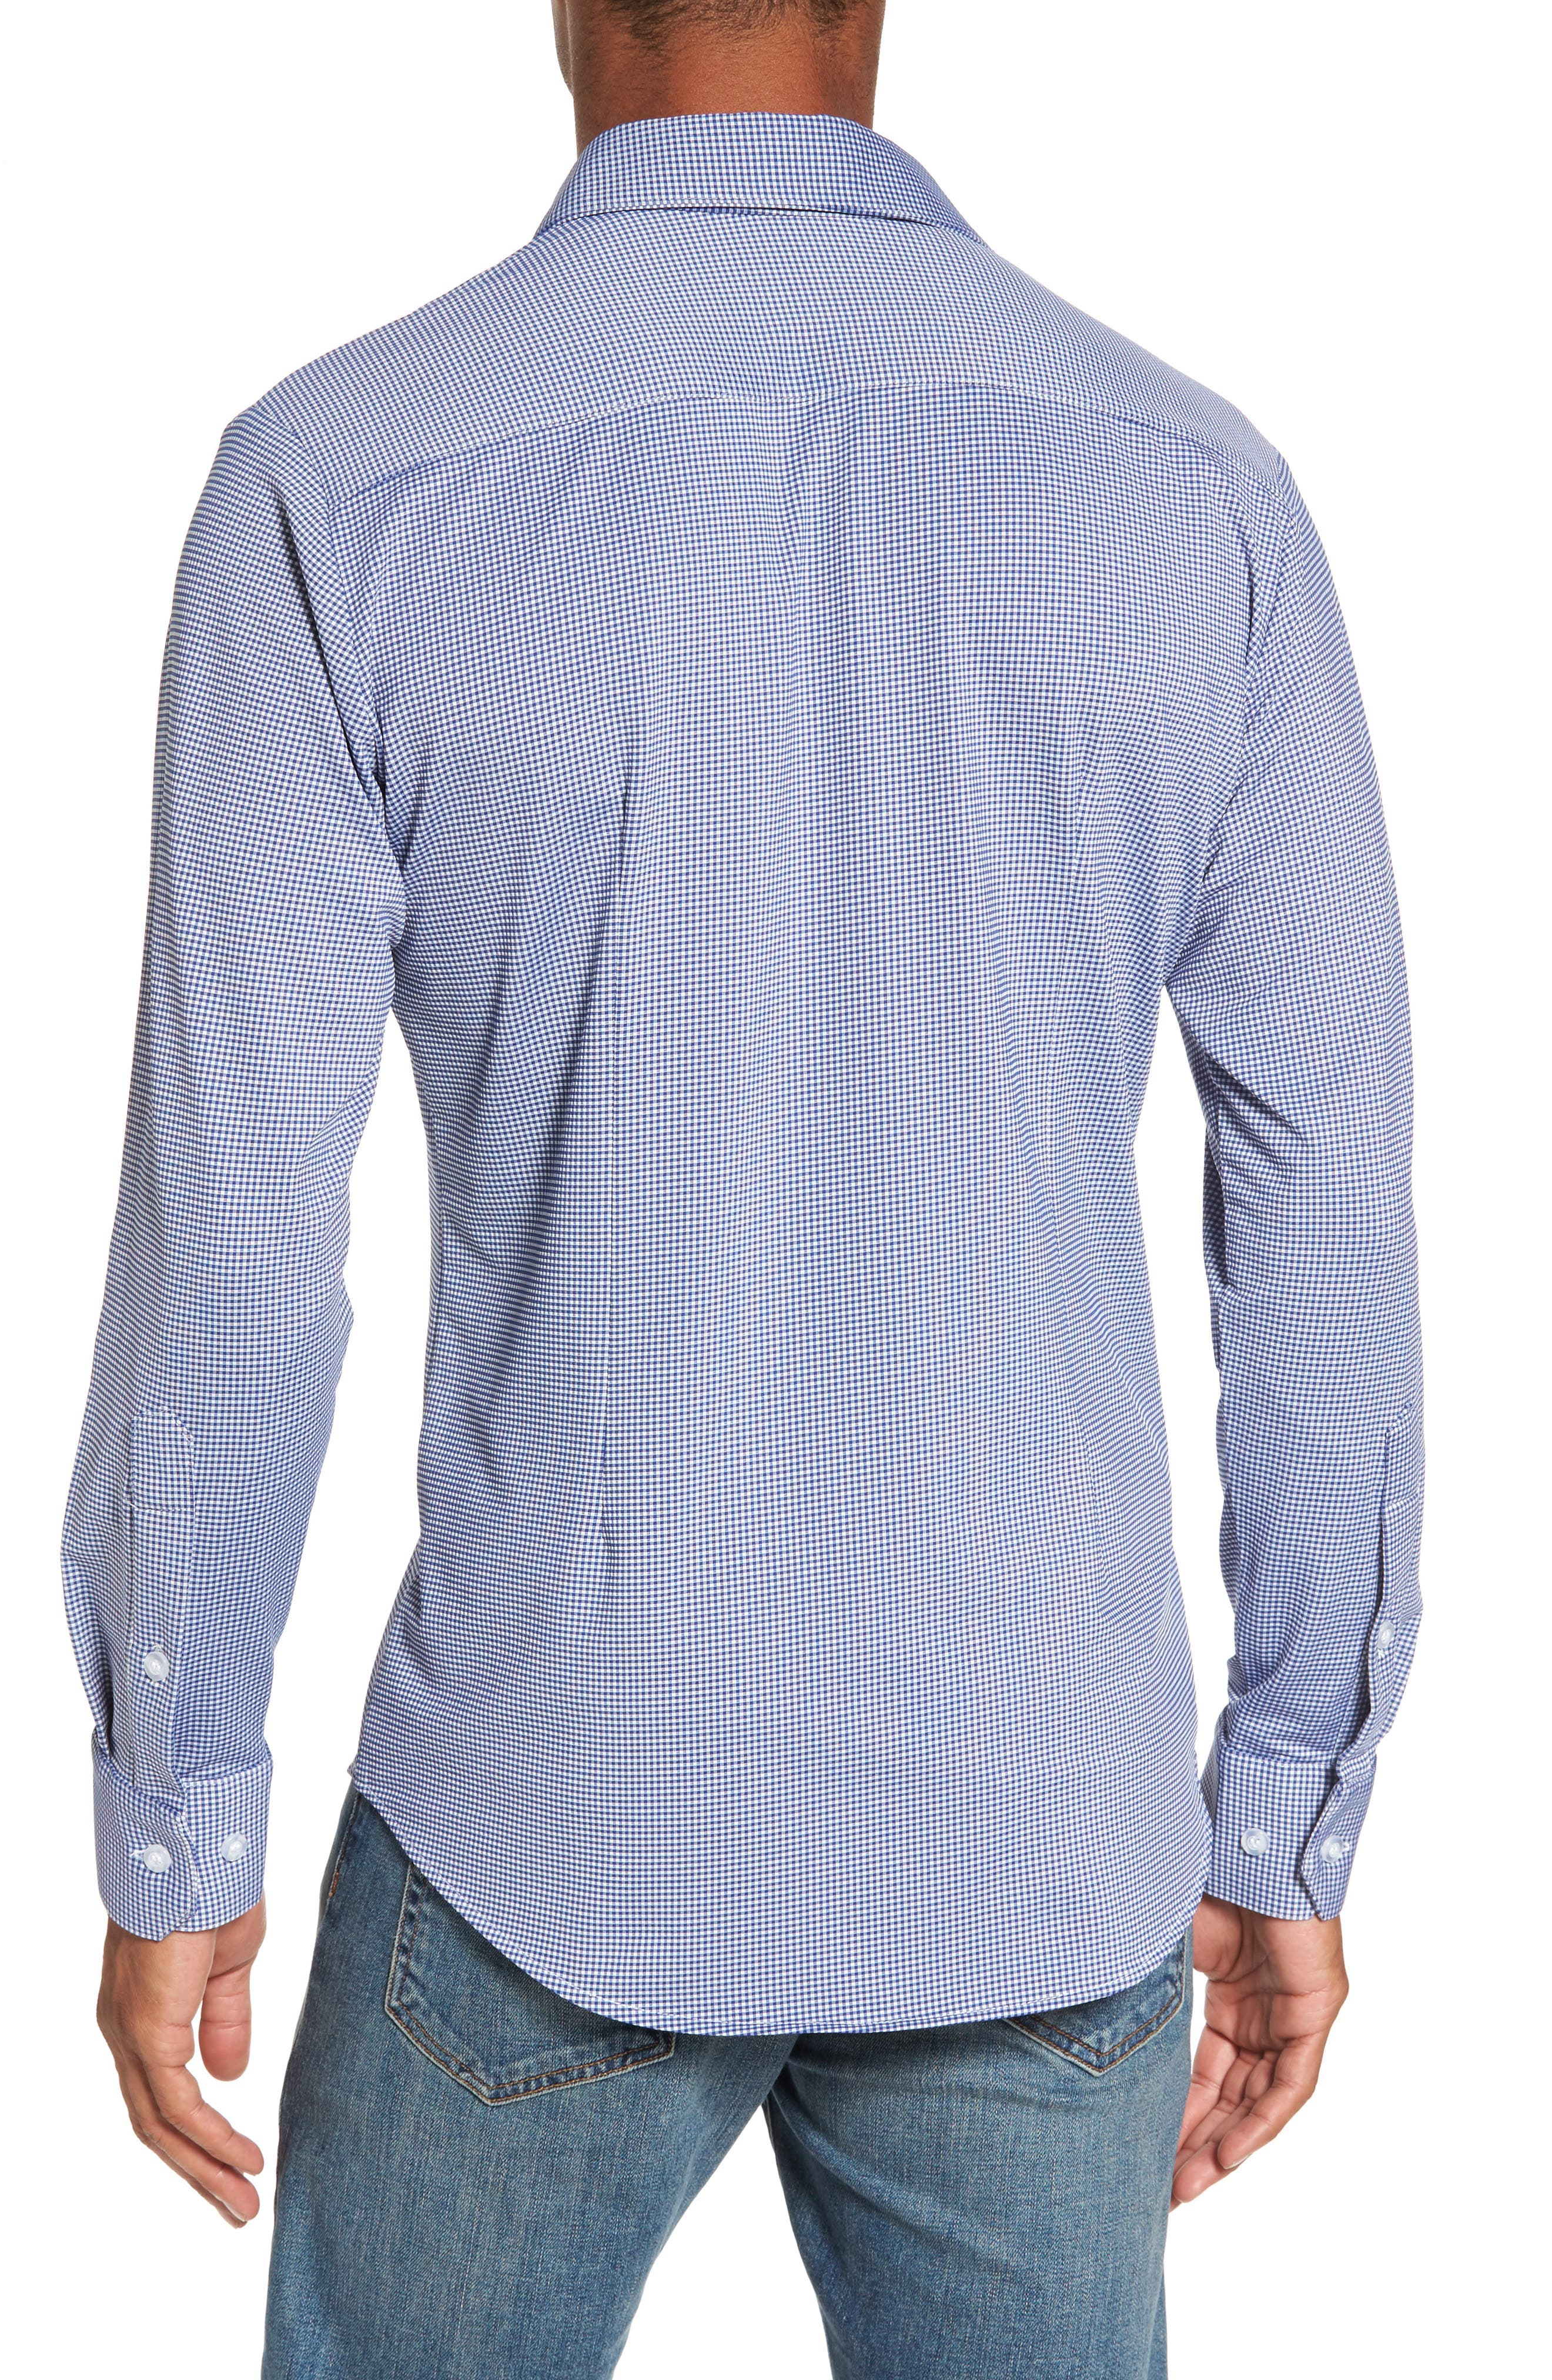 Beckett Gingham Sport Shirt,                             Alternate thumbnail 2, color,                             BLUE